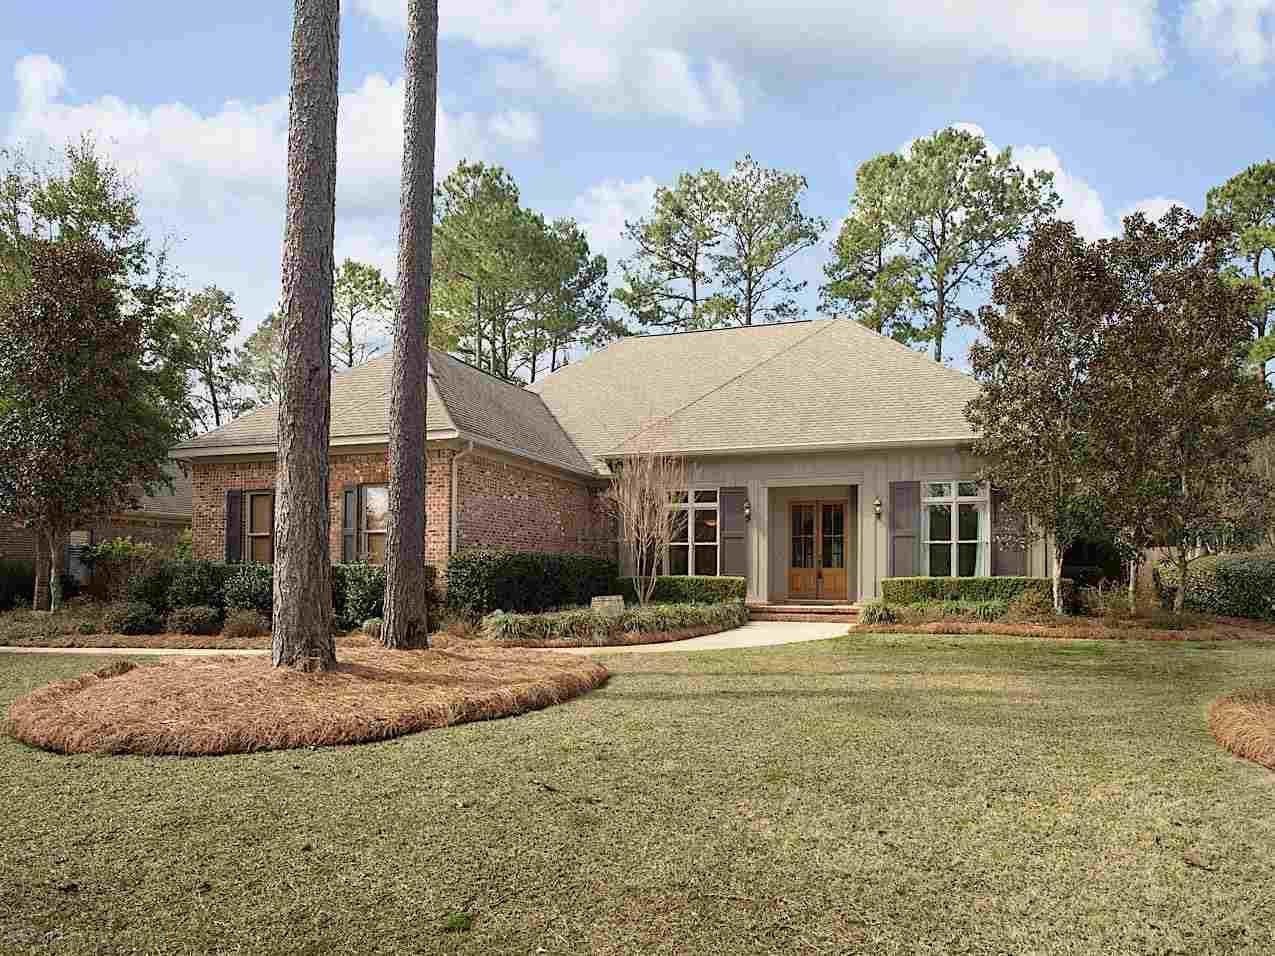 New Homes For Sale Baldwin County Al